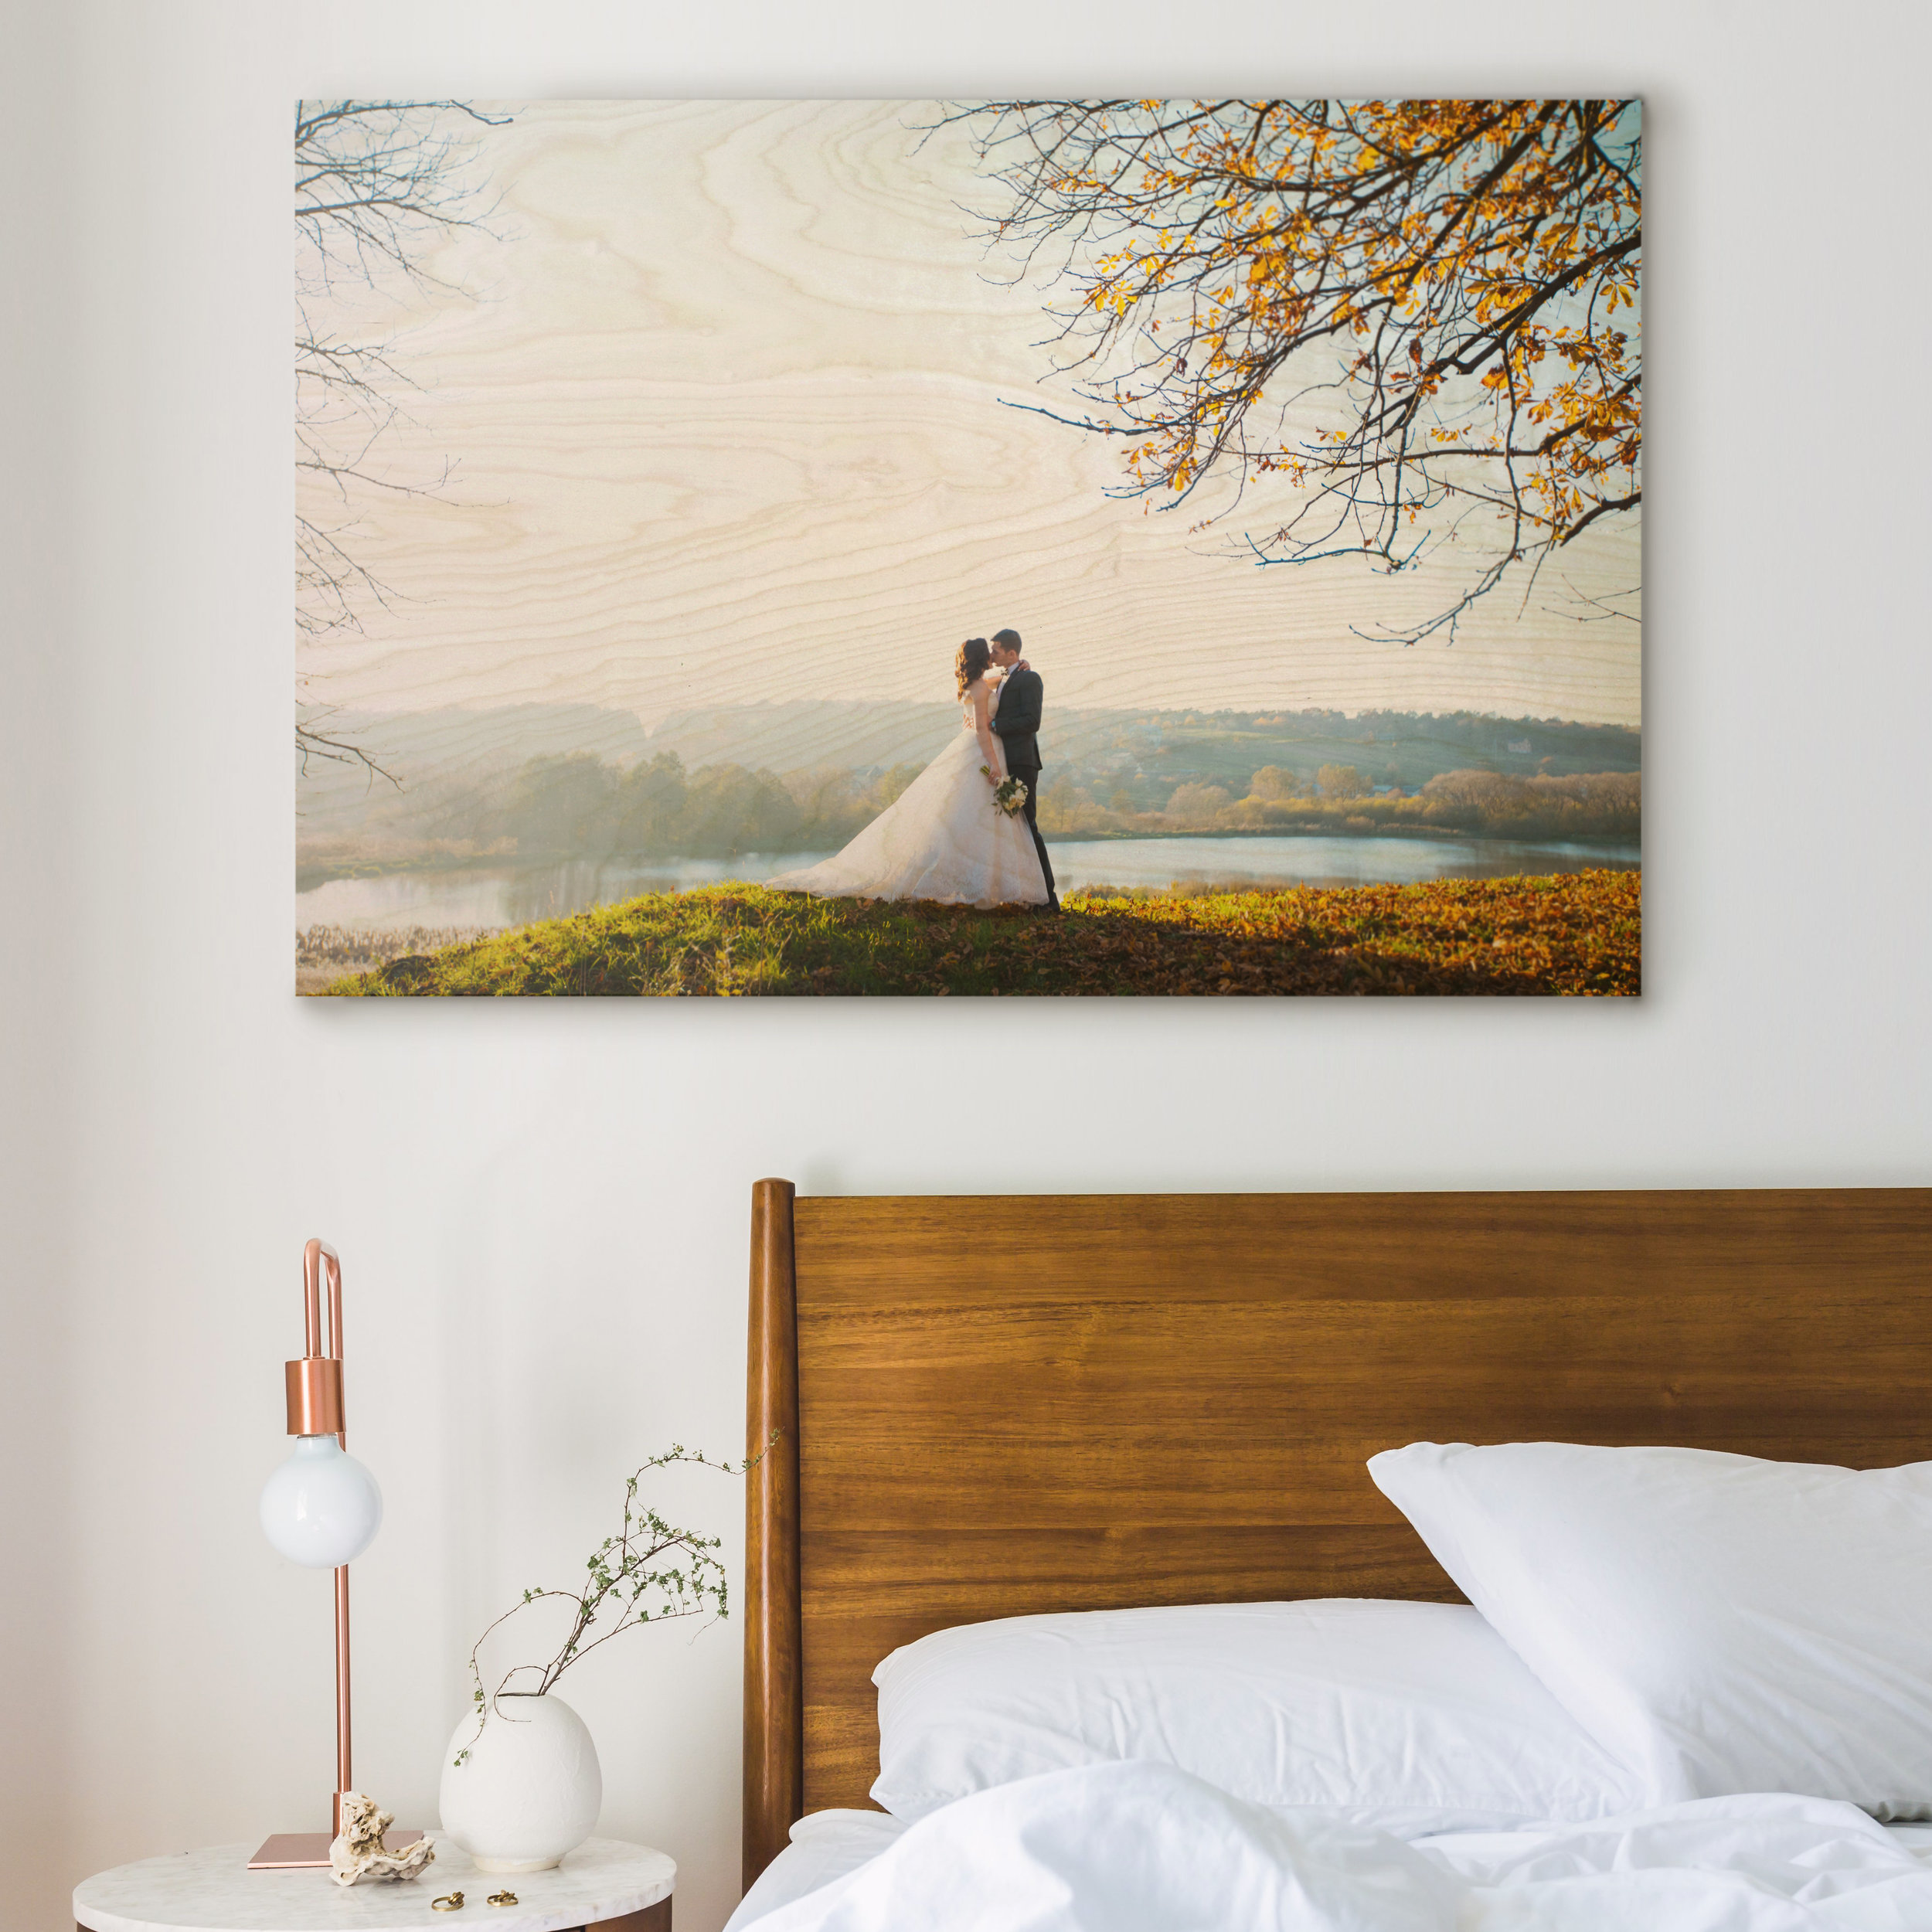 autumn wedding plywood print photo in bedroom interior